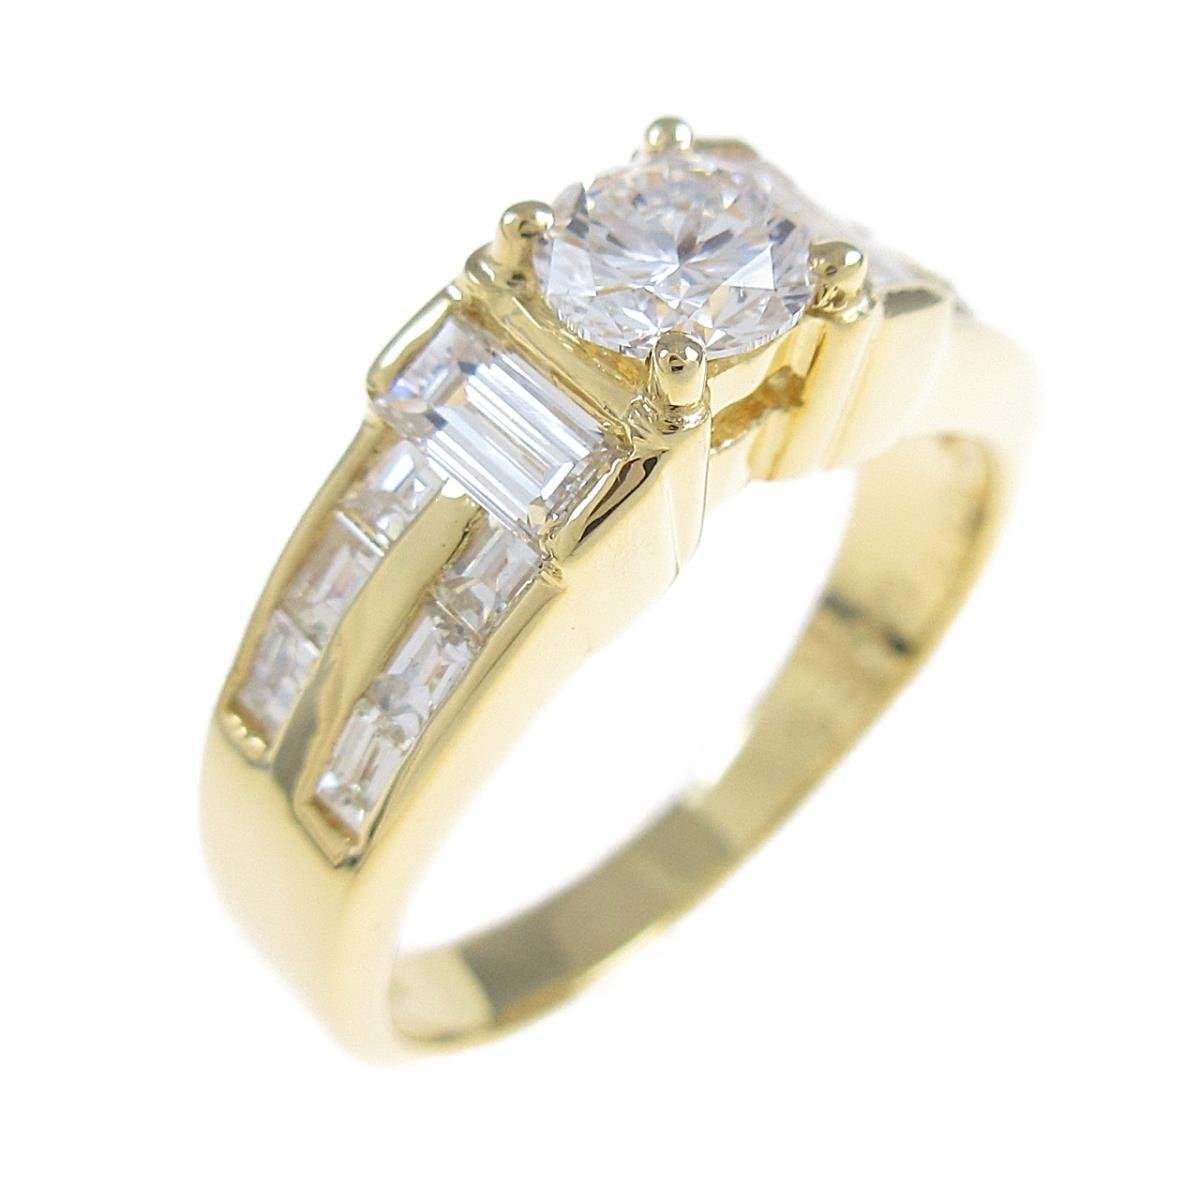 K18YG ダイヤモンドリング 0.364ct・E・SI2・GOOD【中古】